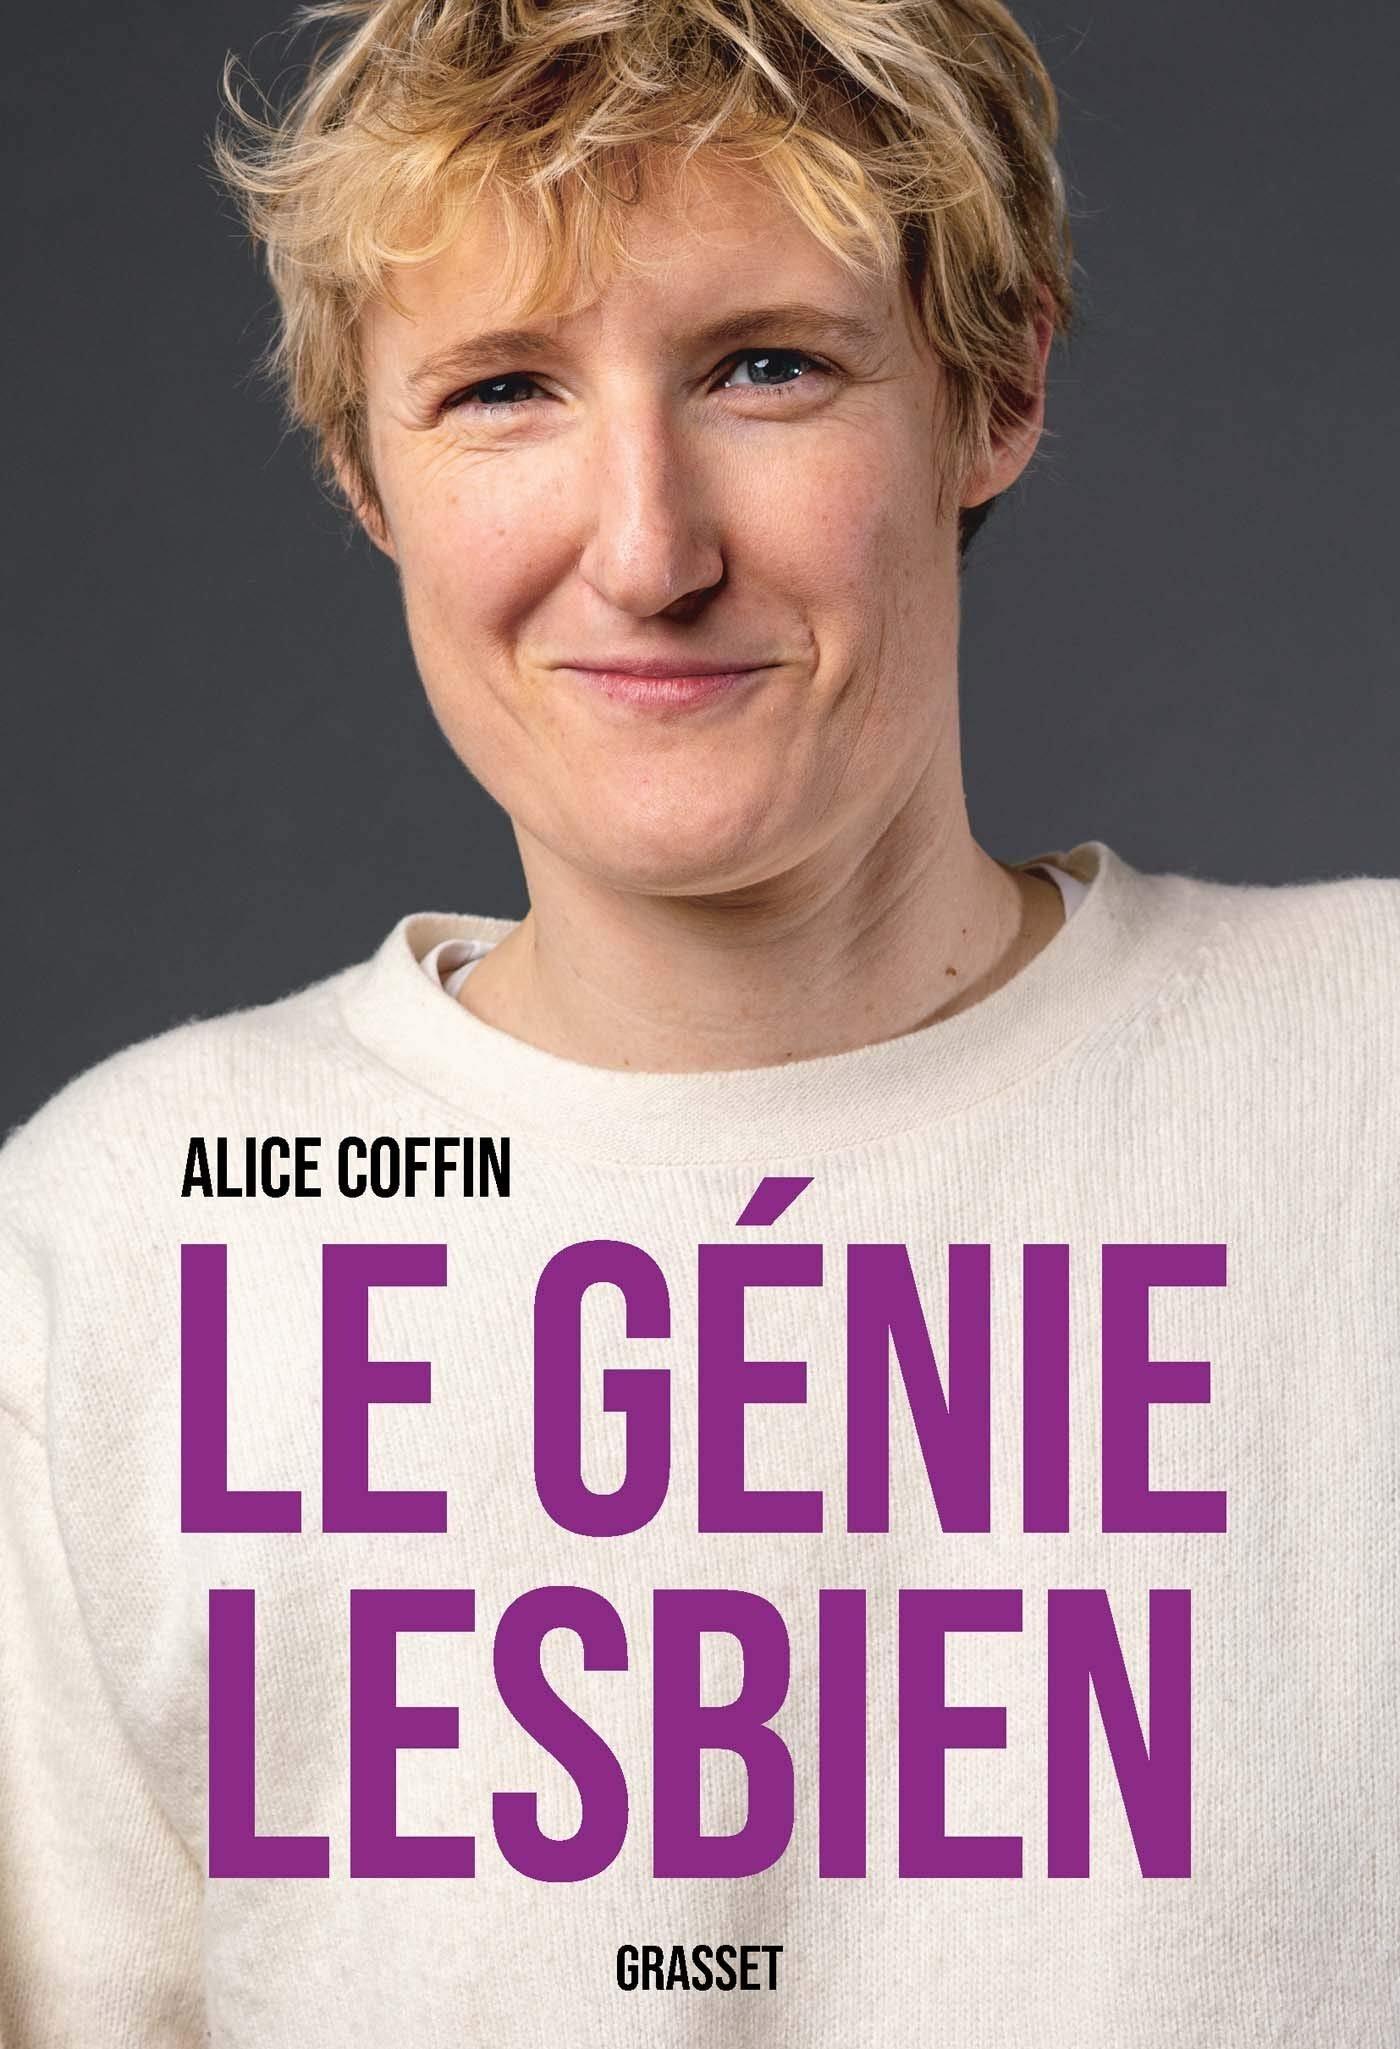 lesbian author